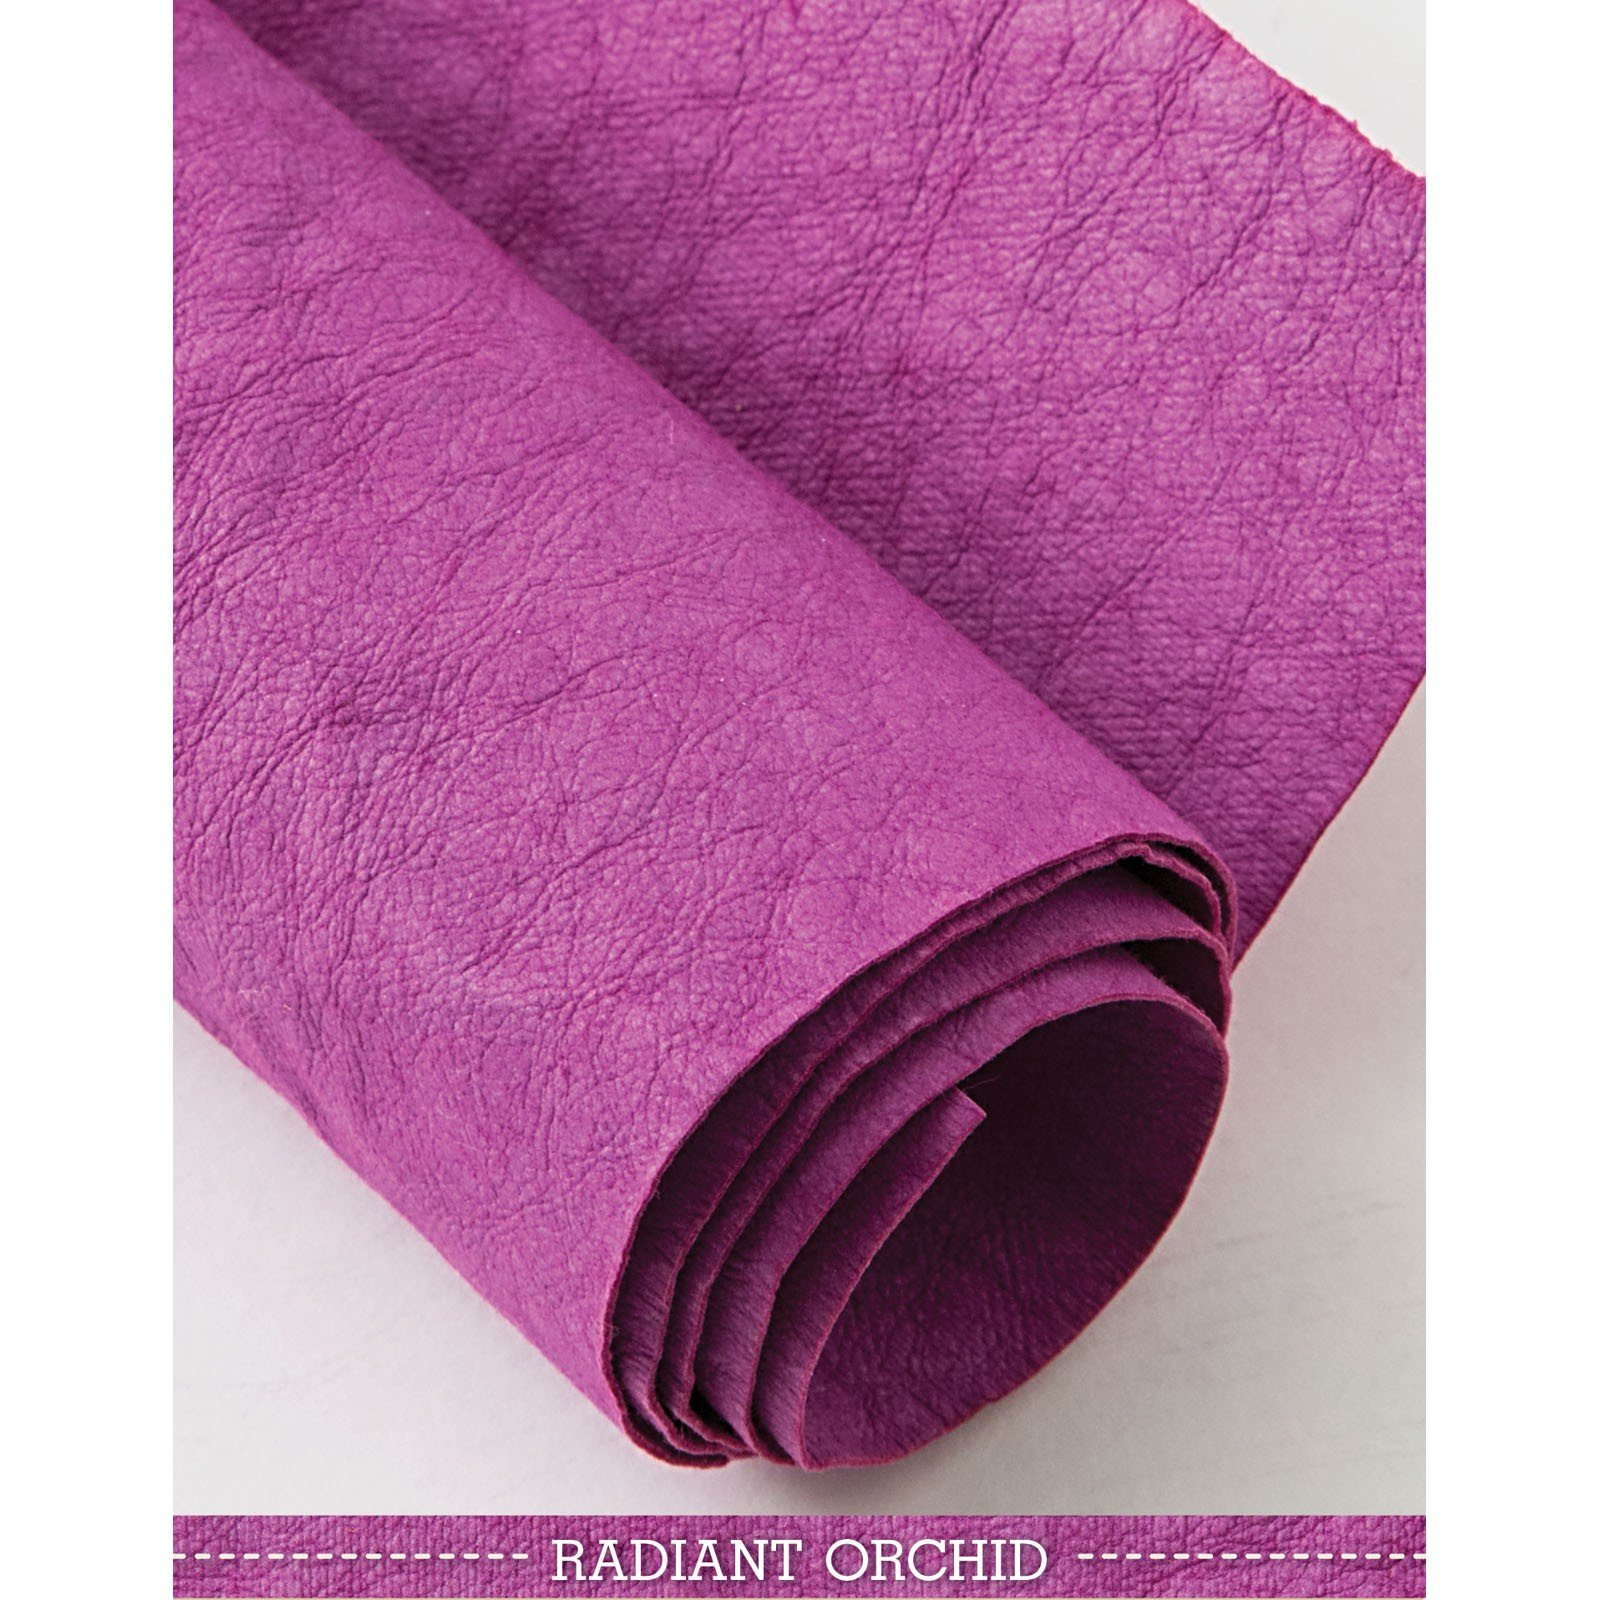 Radiant Orchid Kraft-Tex Designer Paper Fabric - approx. 18 x 28 - prewashed - CTP20384